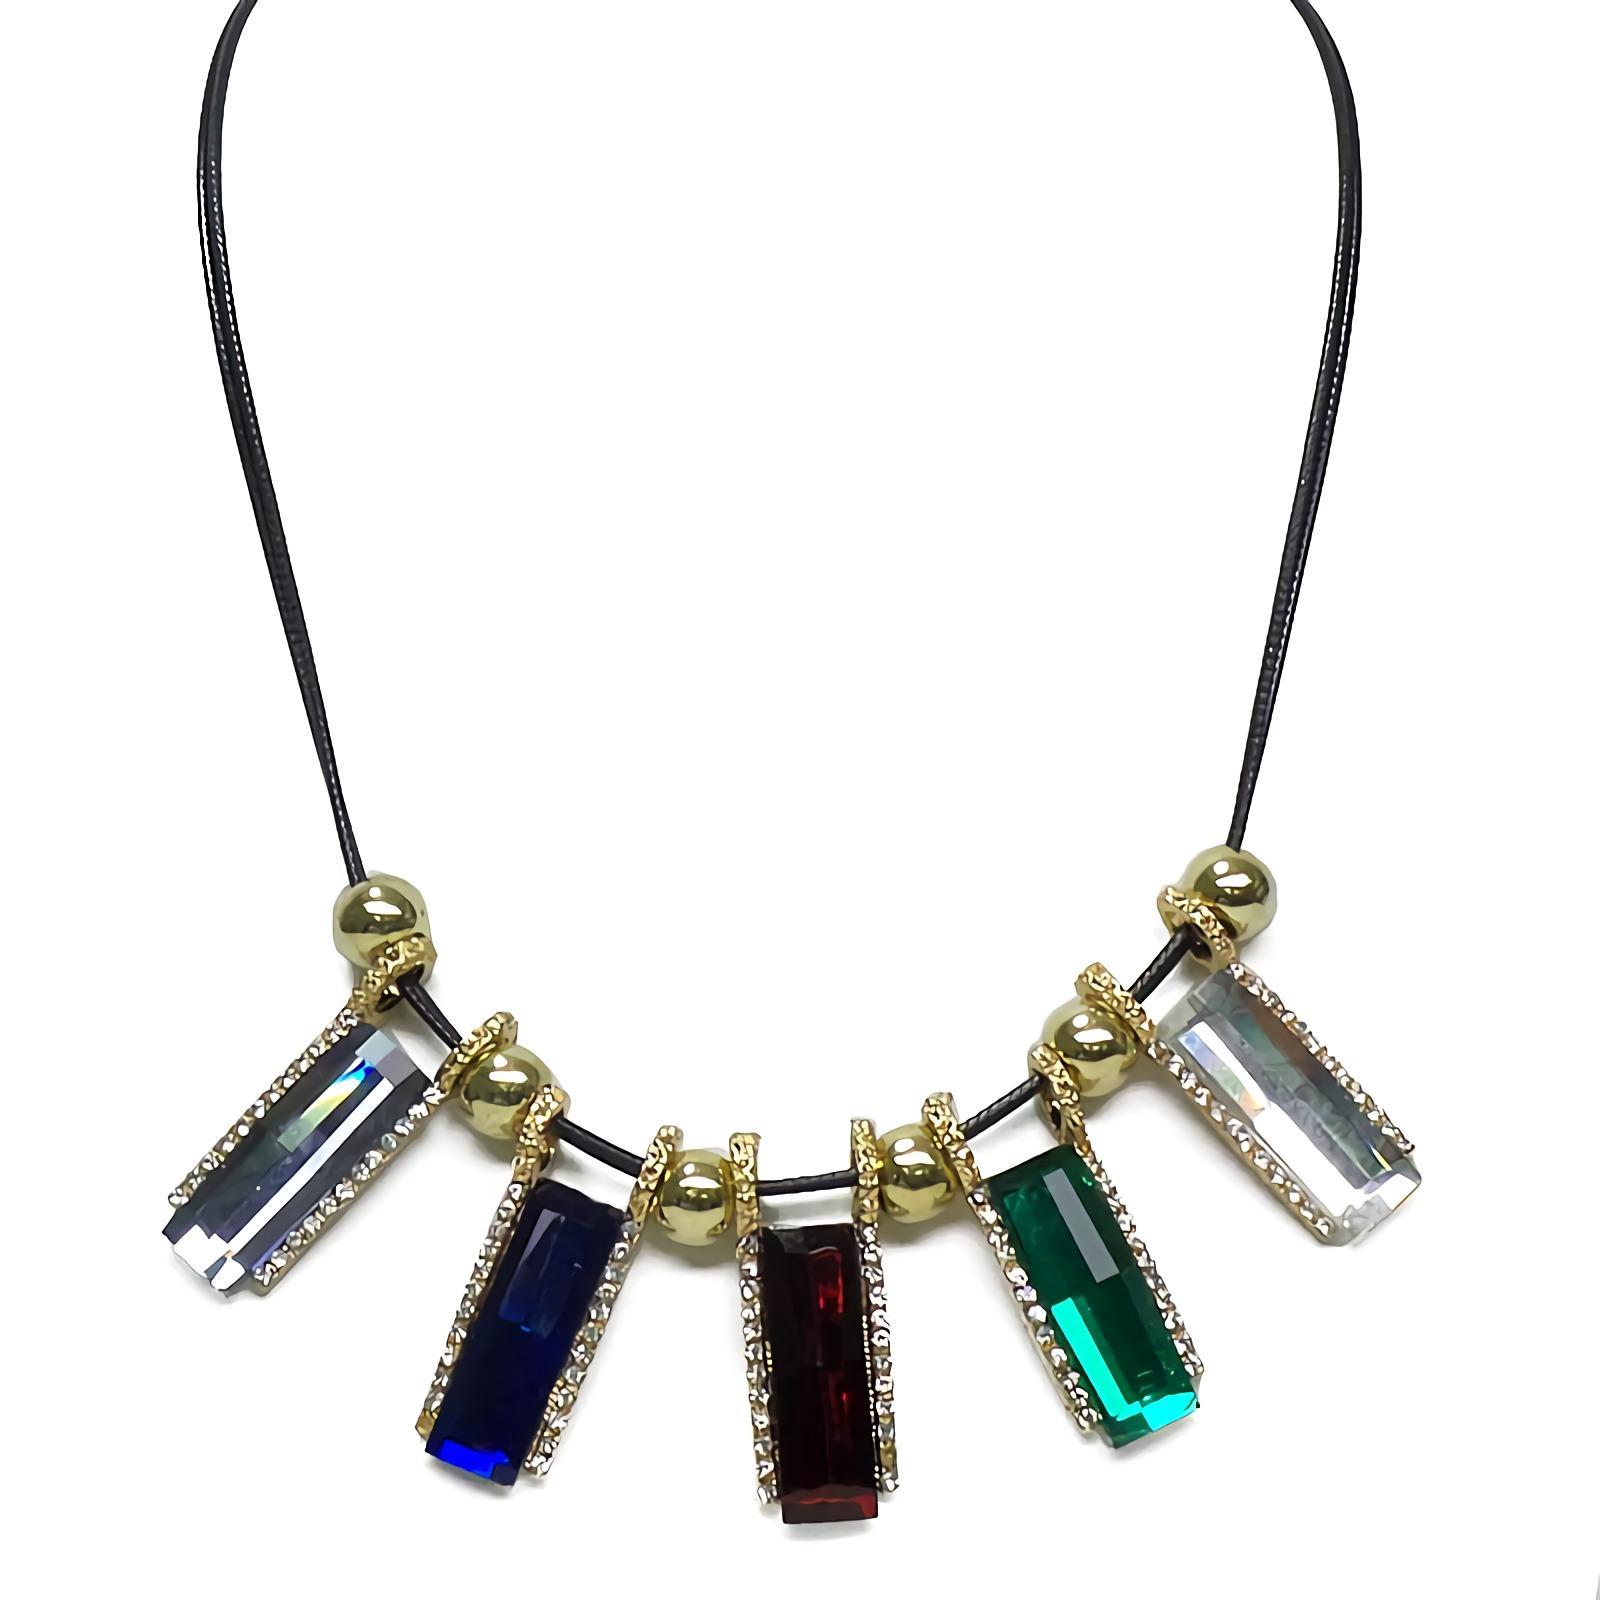 Rp 10.948. OFASHION Aksesoris Kalung CA-180314-K015 Necklace Fashion Xuping Jewelry Hitam ...